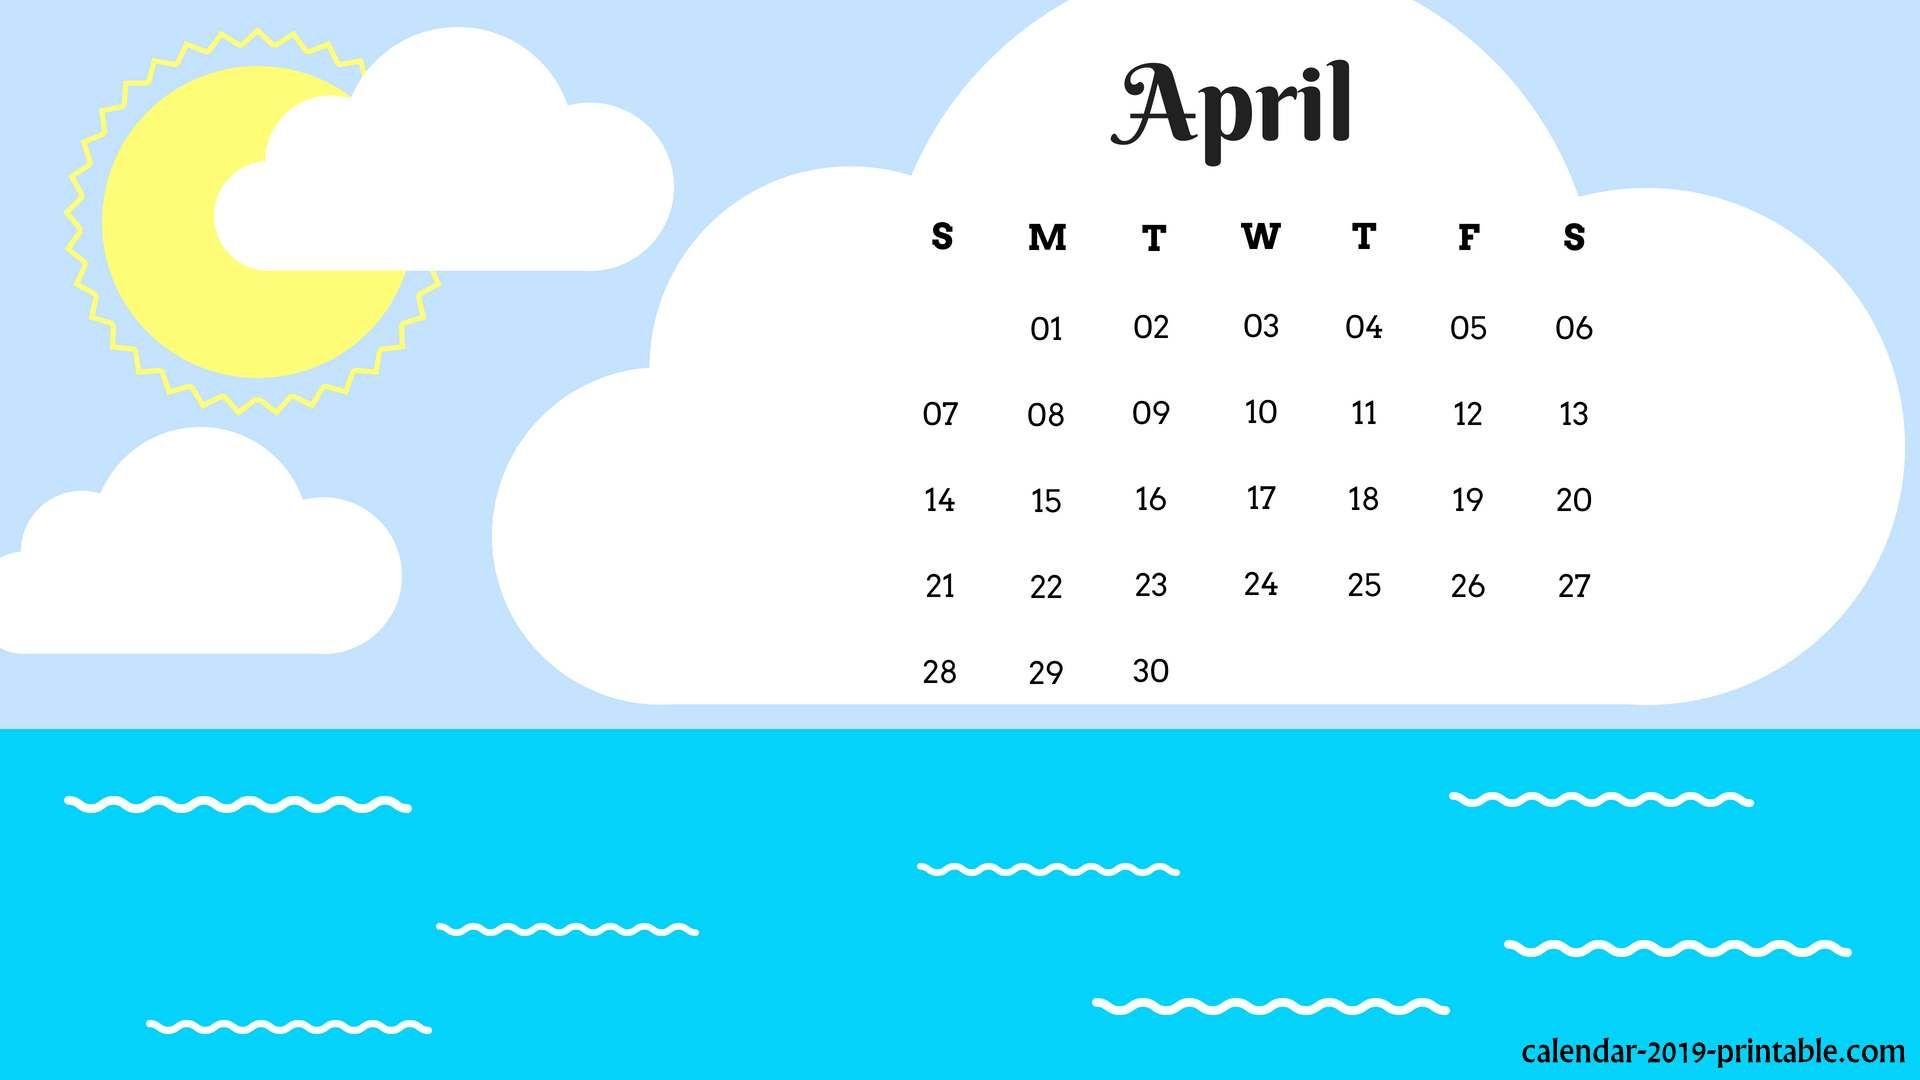 april 2019 calendar wallpaper Calendar 2019 Wallpapers 1920x1080